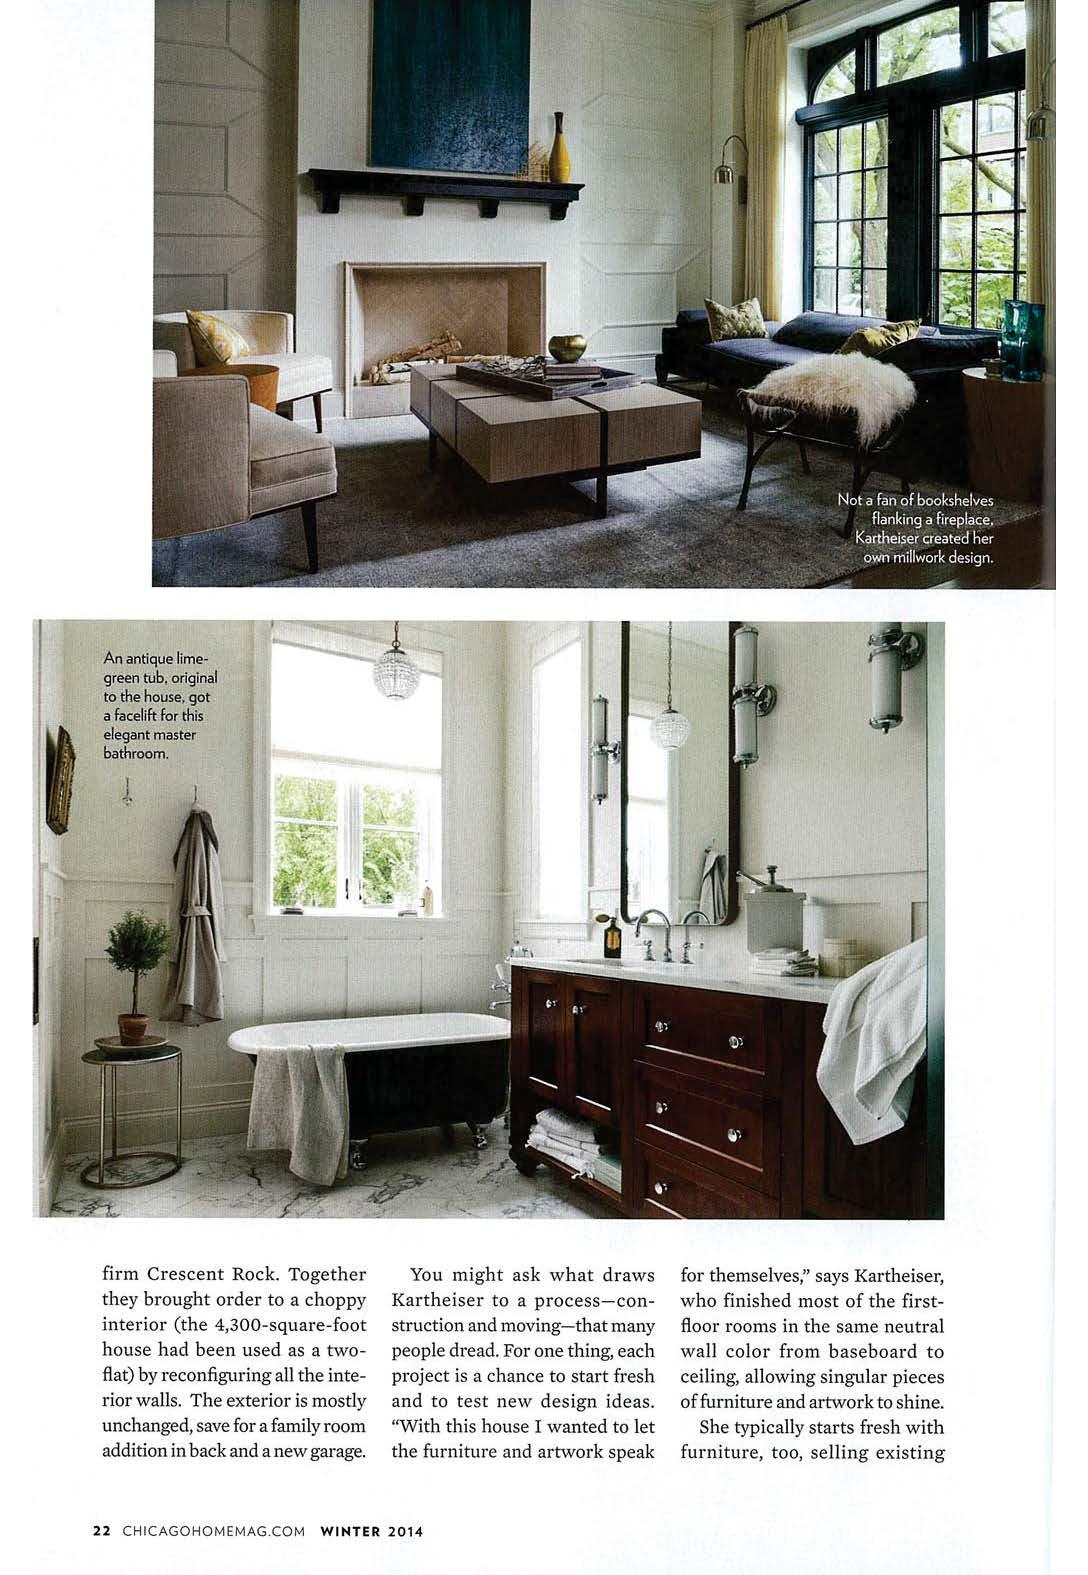 Seminary 2237 N_Chicago Home + Garden_Magazine Article_Page_6.jpg